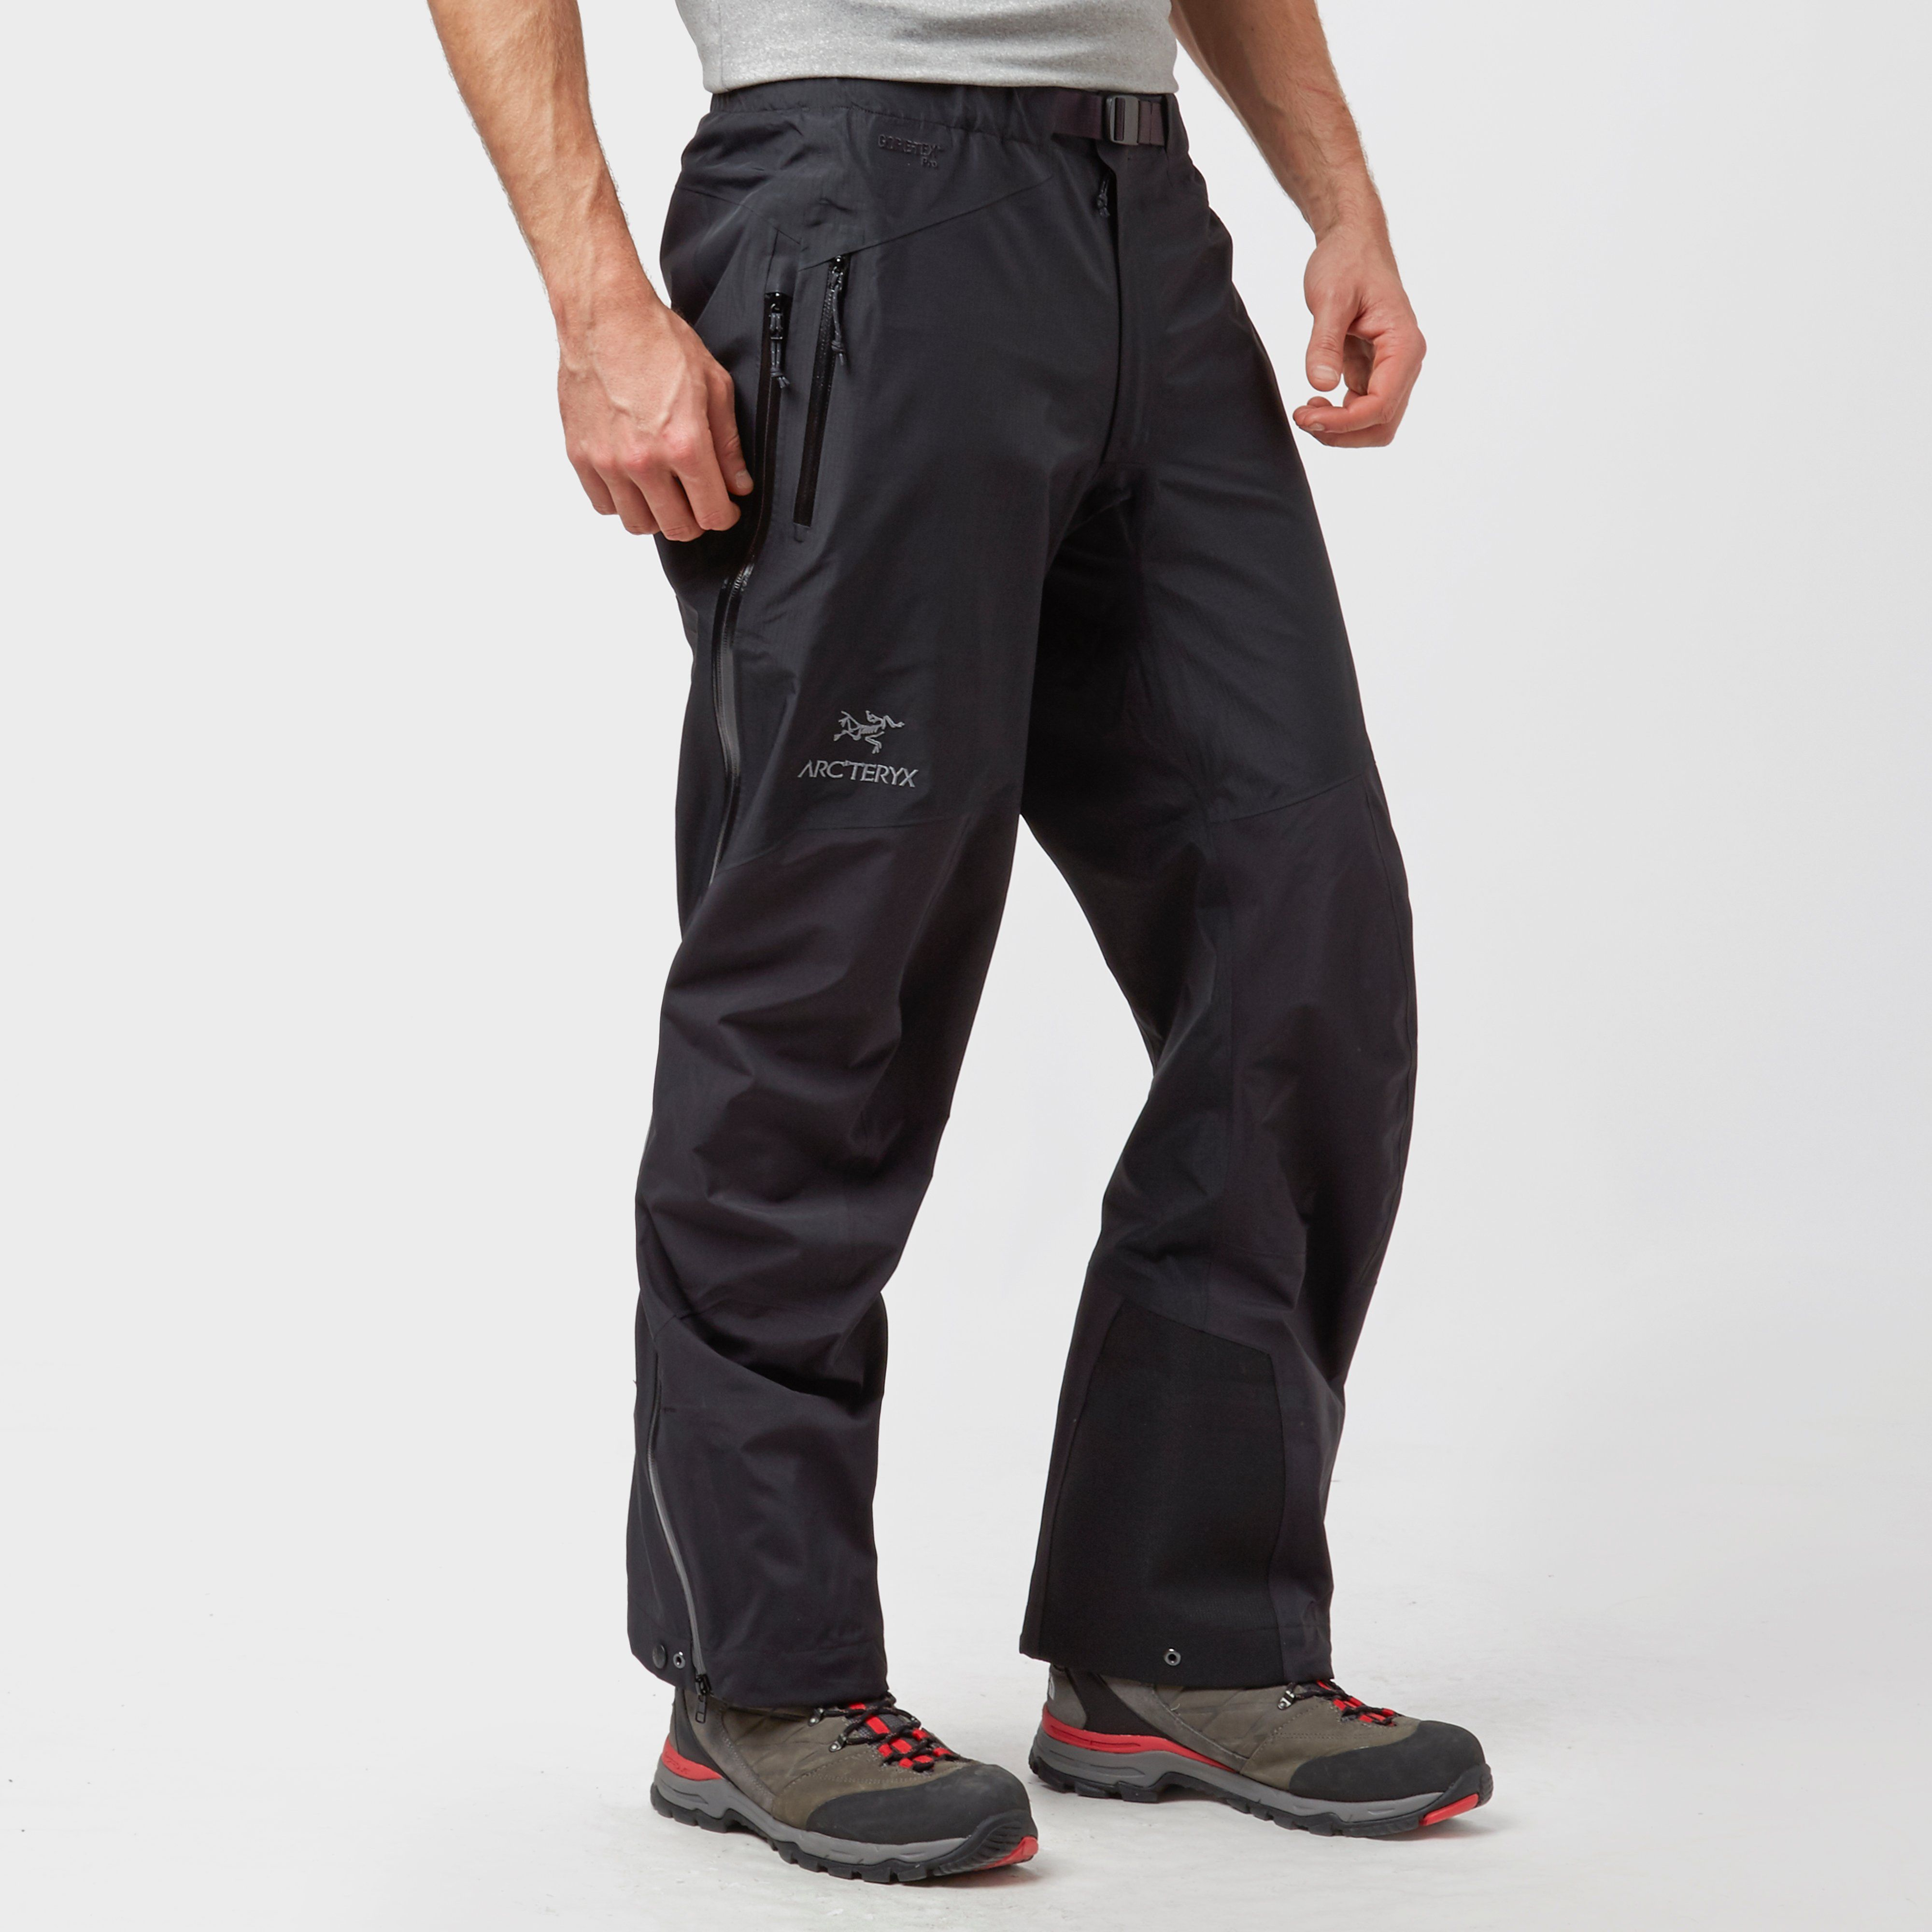 ARC'TERYX Men's Beta SL Waterproof Pant